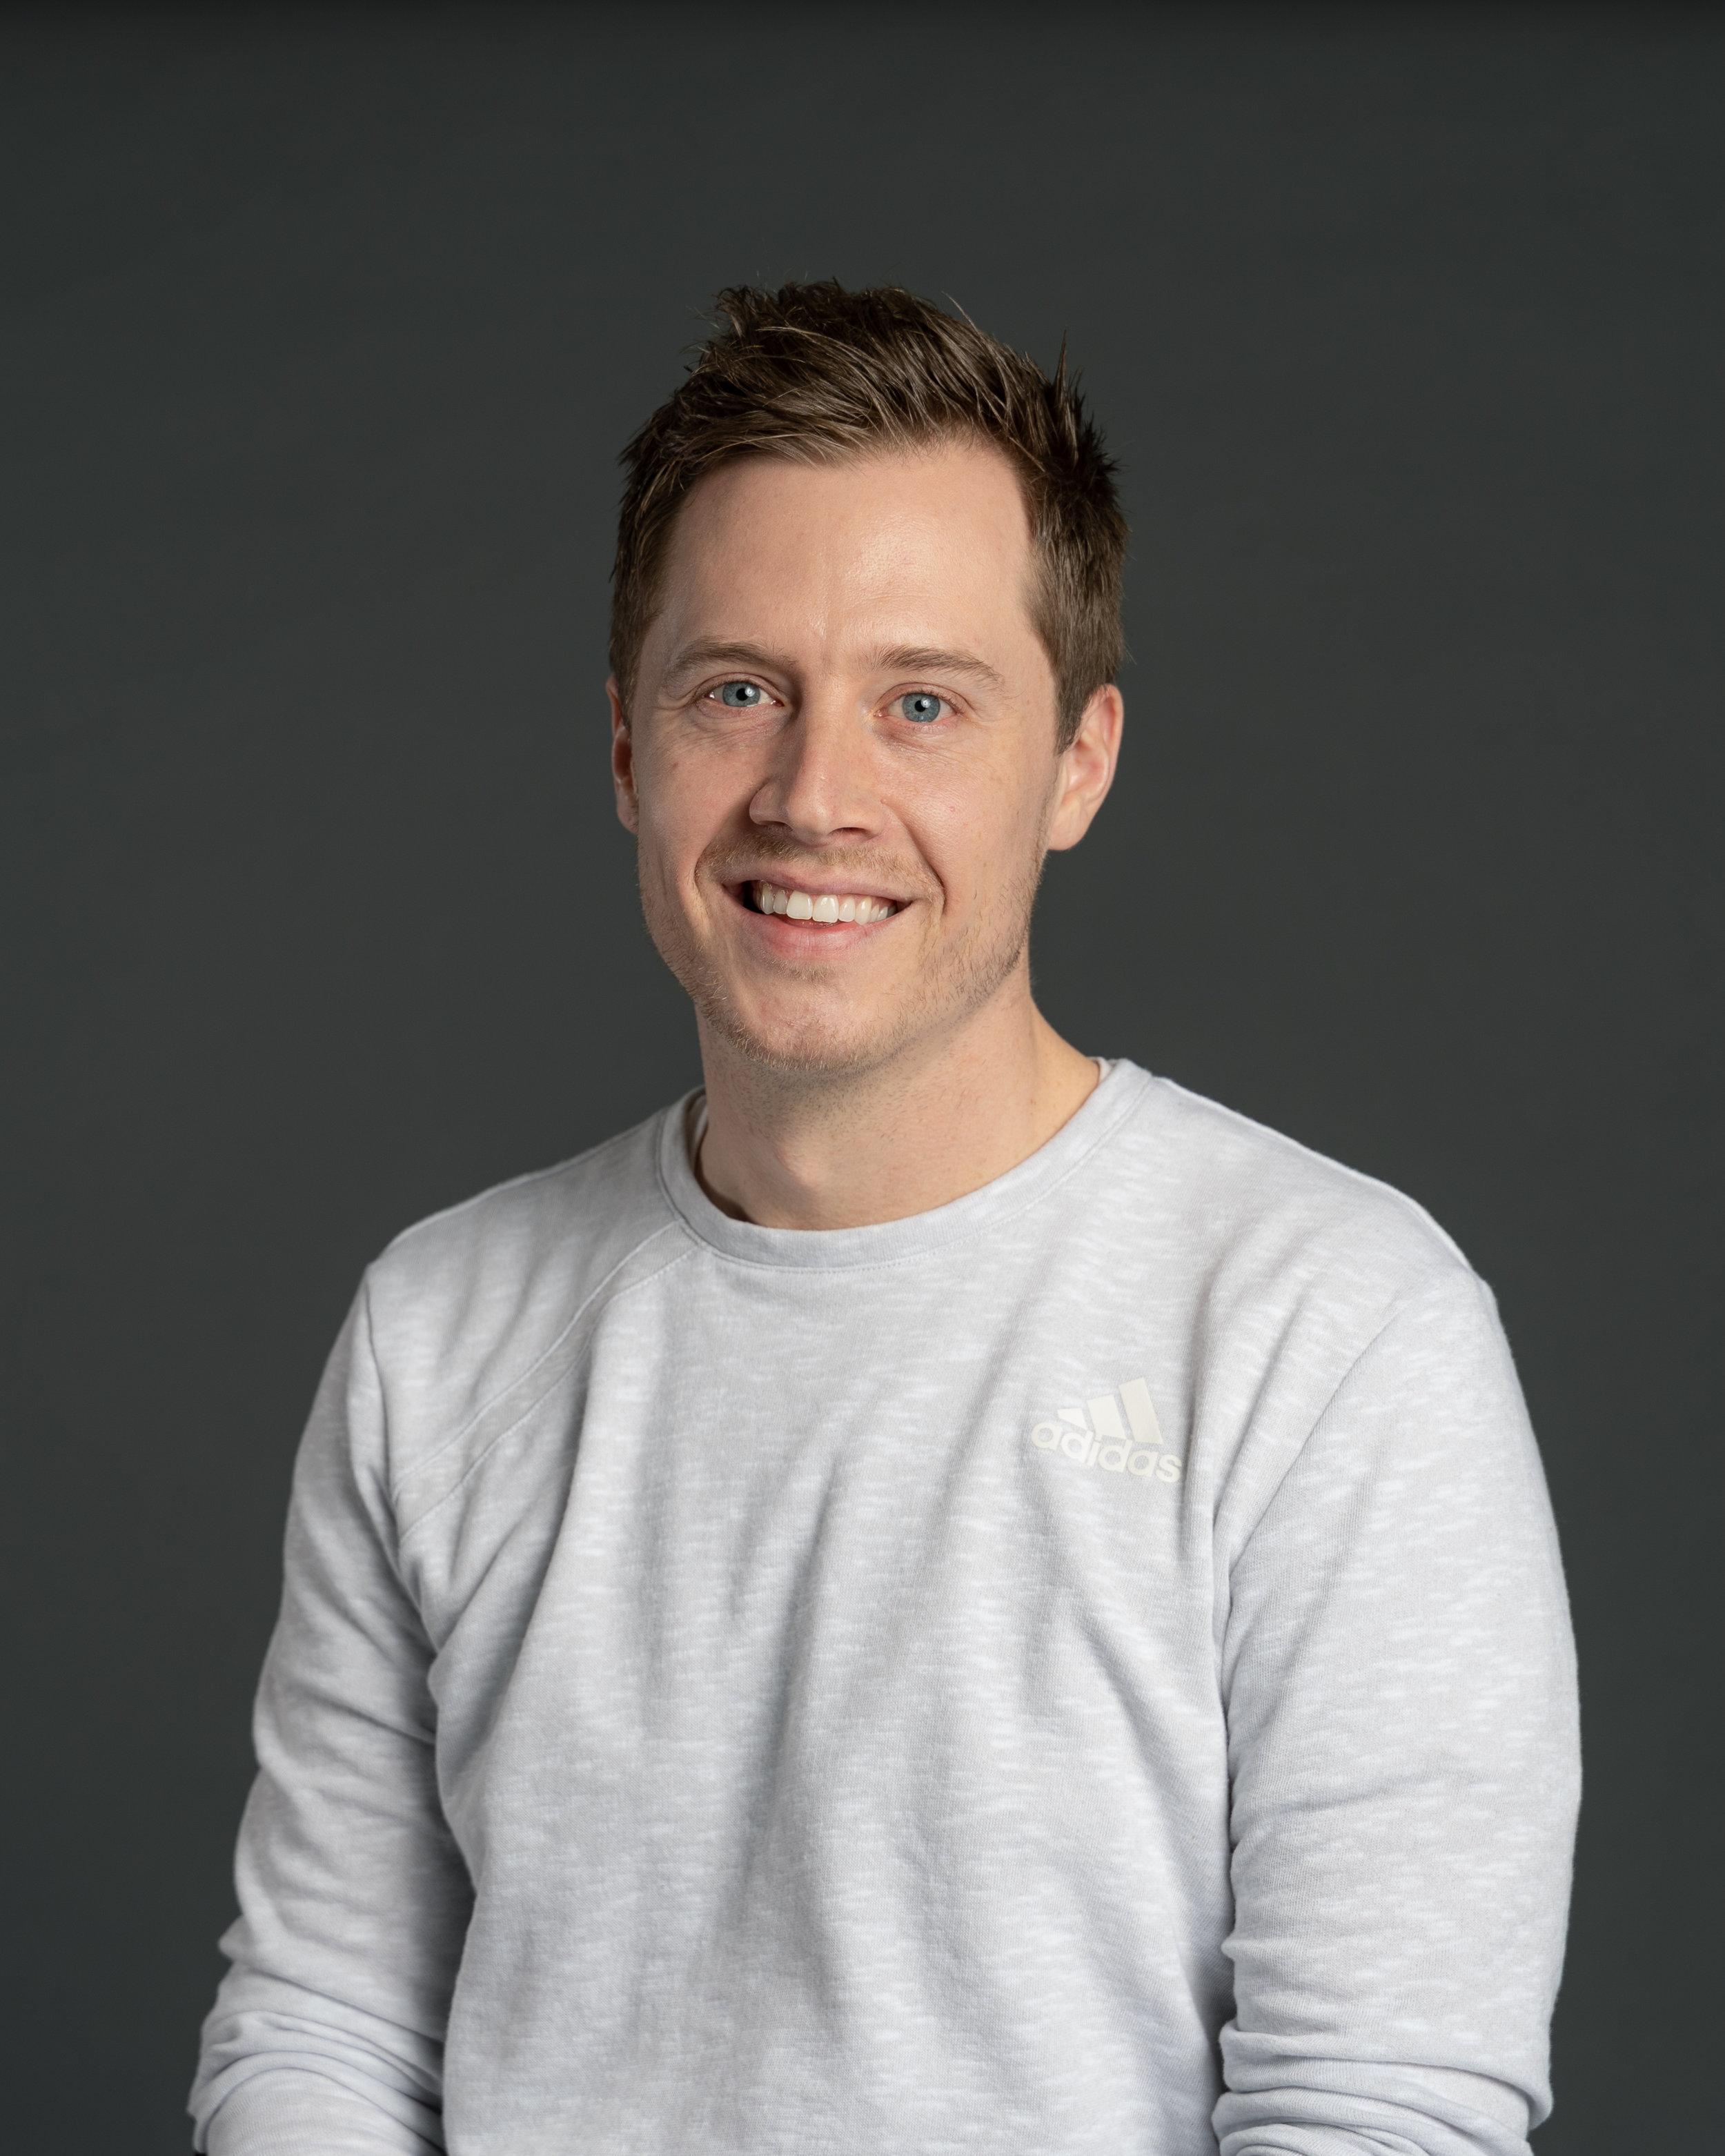 Ian Jones - Photographer/Social Media Specialist